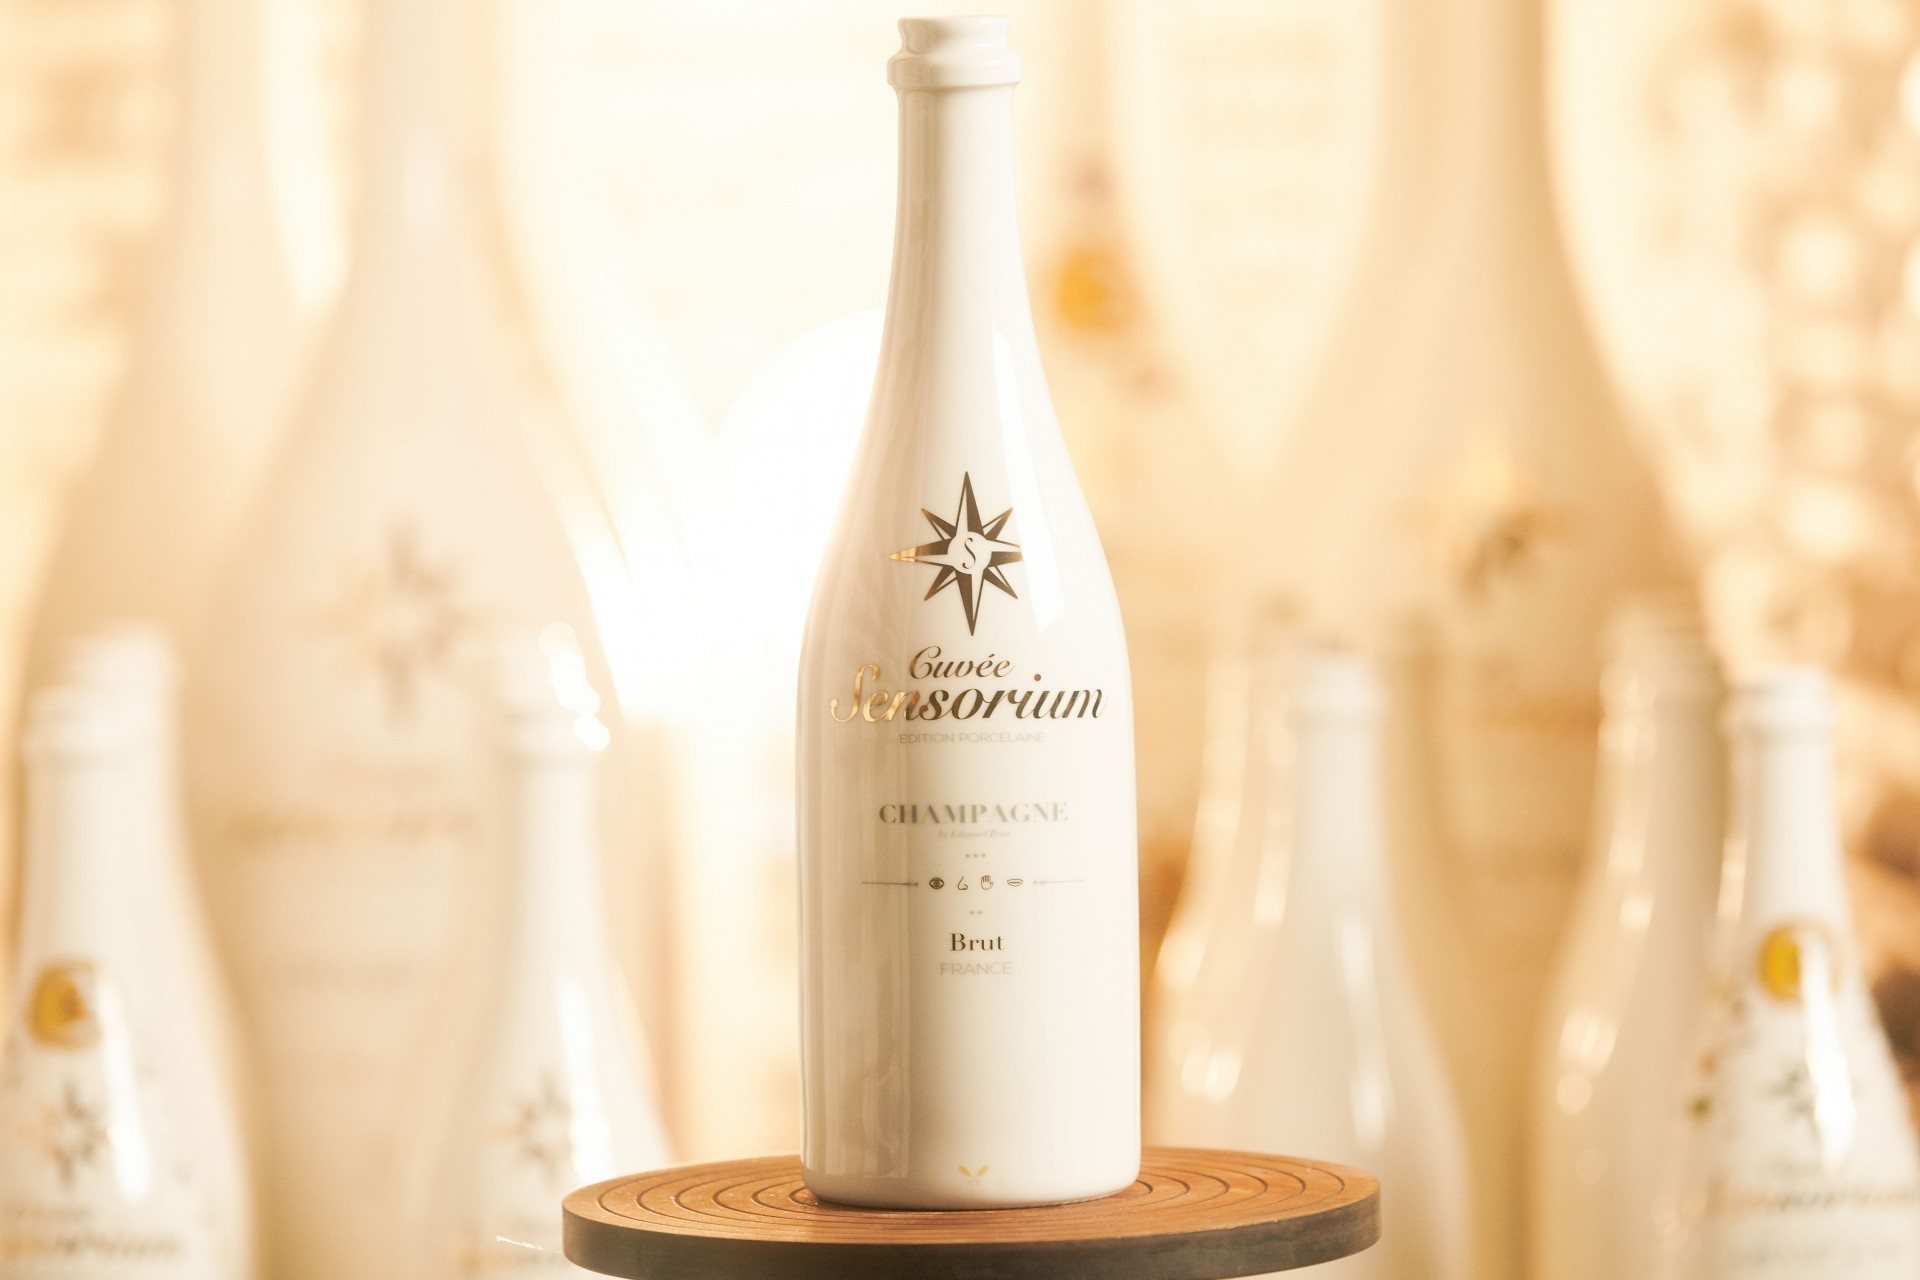 CAROLIN WINDEL Porzellanmanufaktur Reichenbach, Cuvée Sensorium Champagne (more-click here)